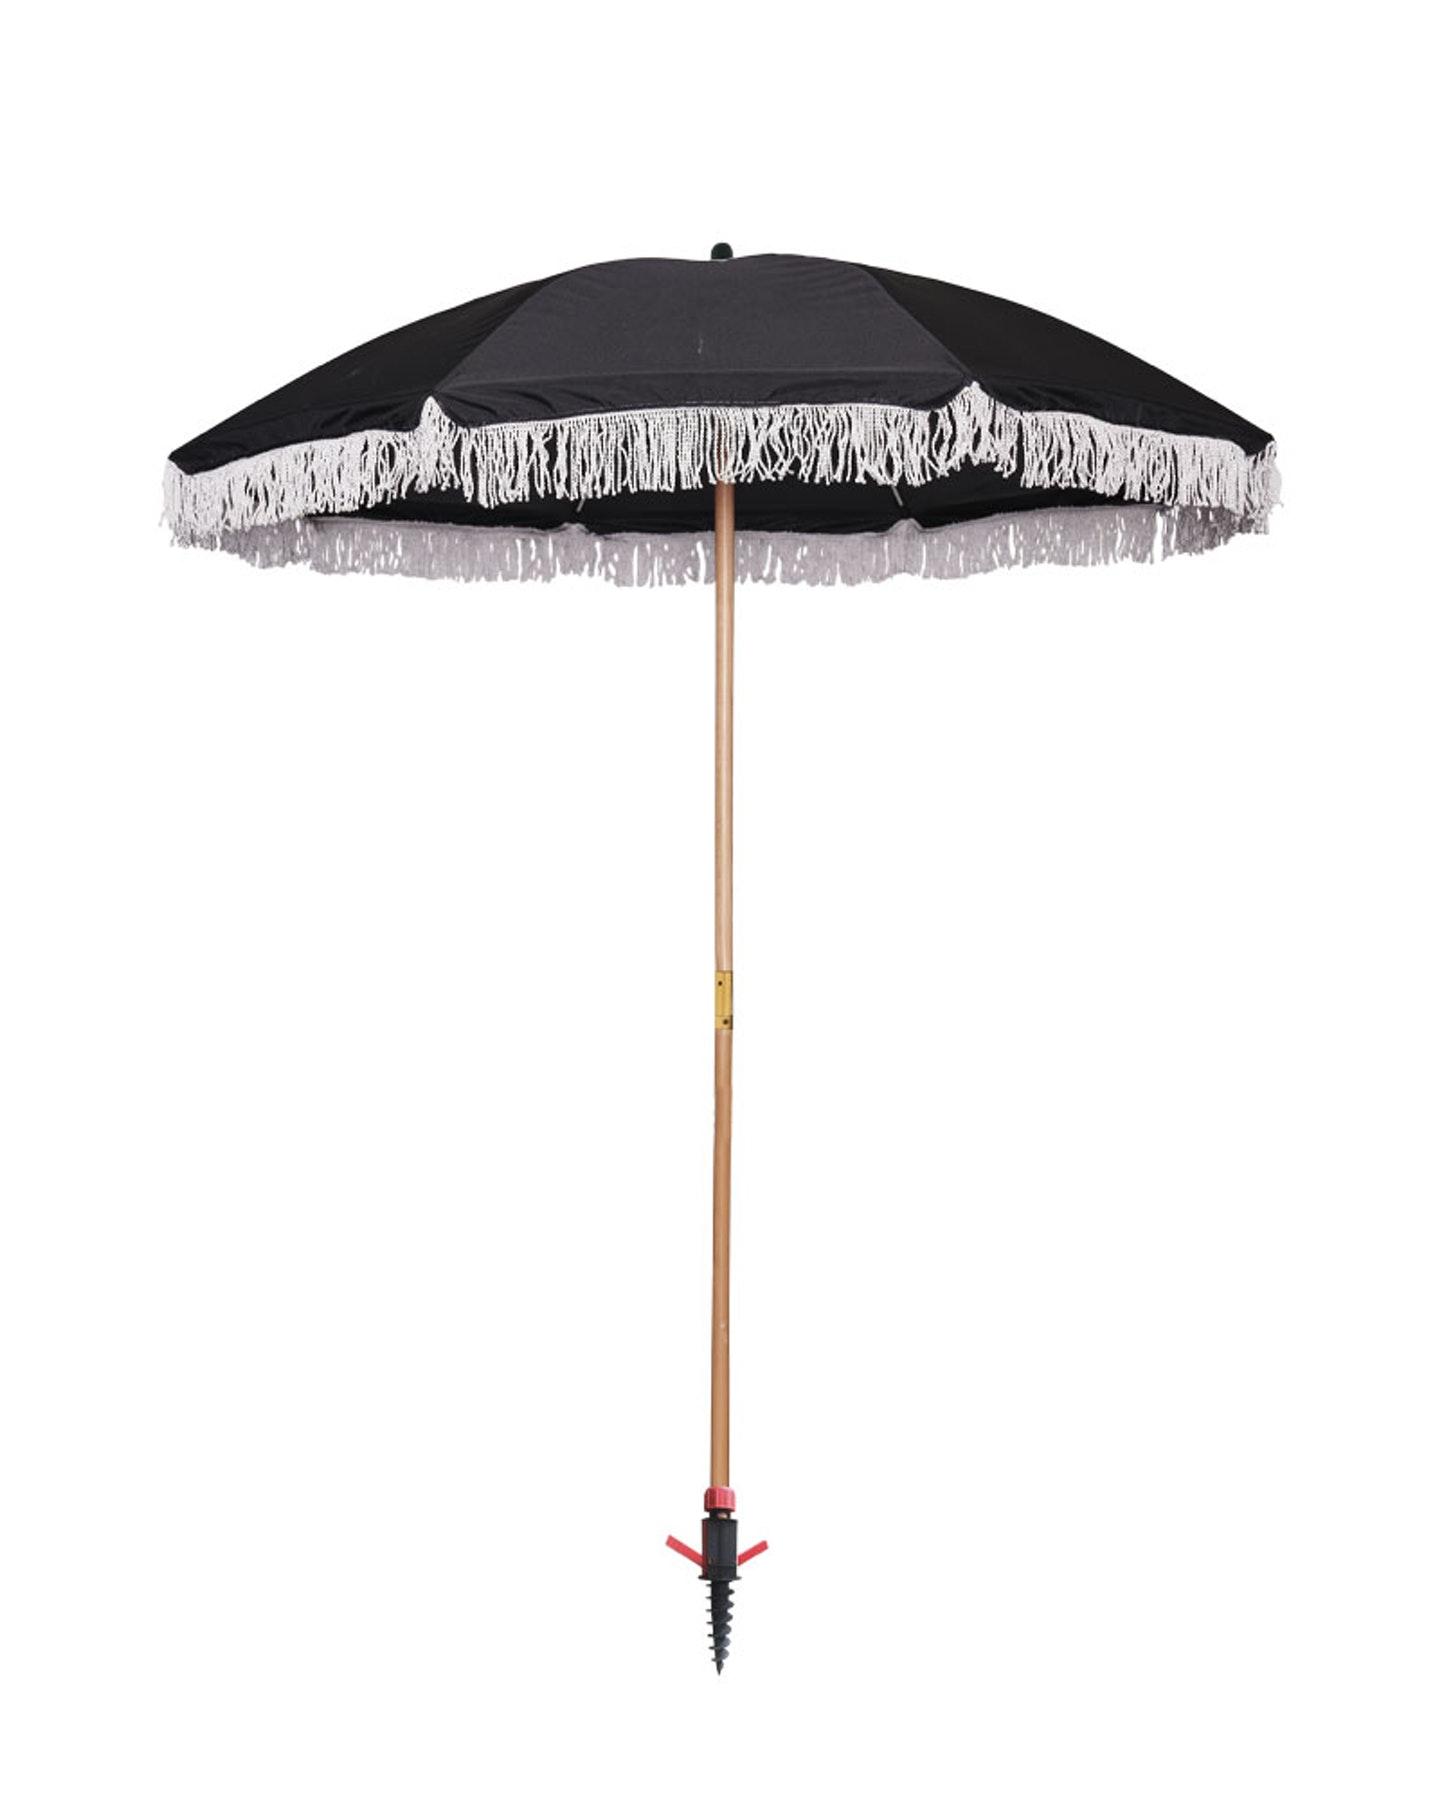 Project Blank Spf50+ Eco Recycled Beach Umbrella Black